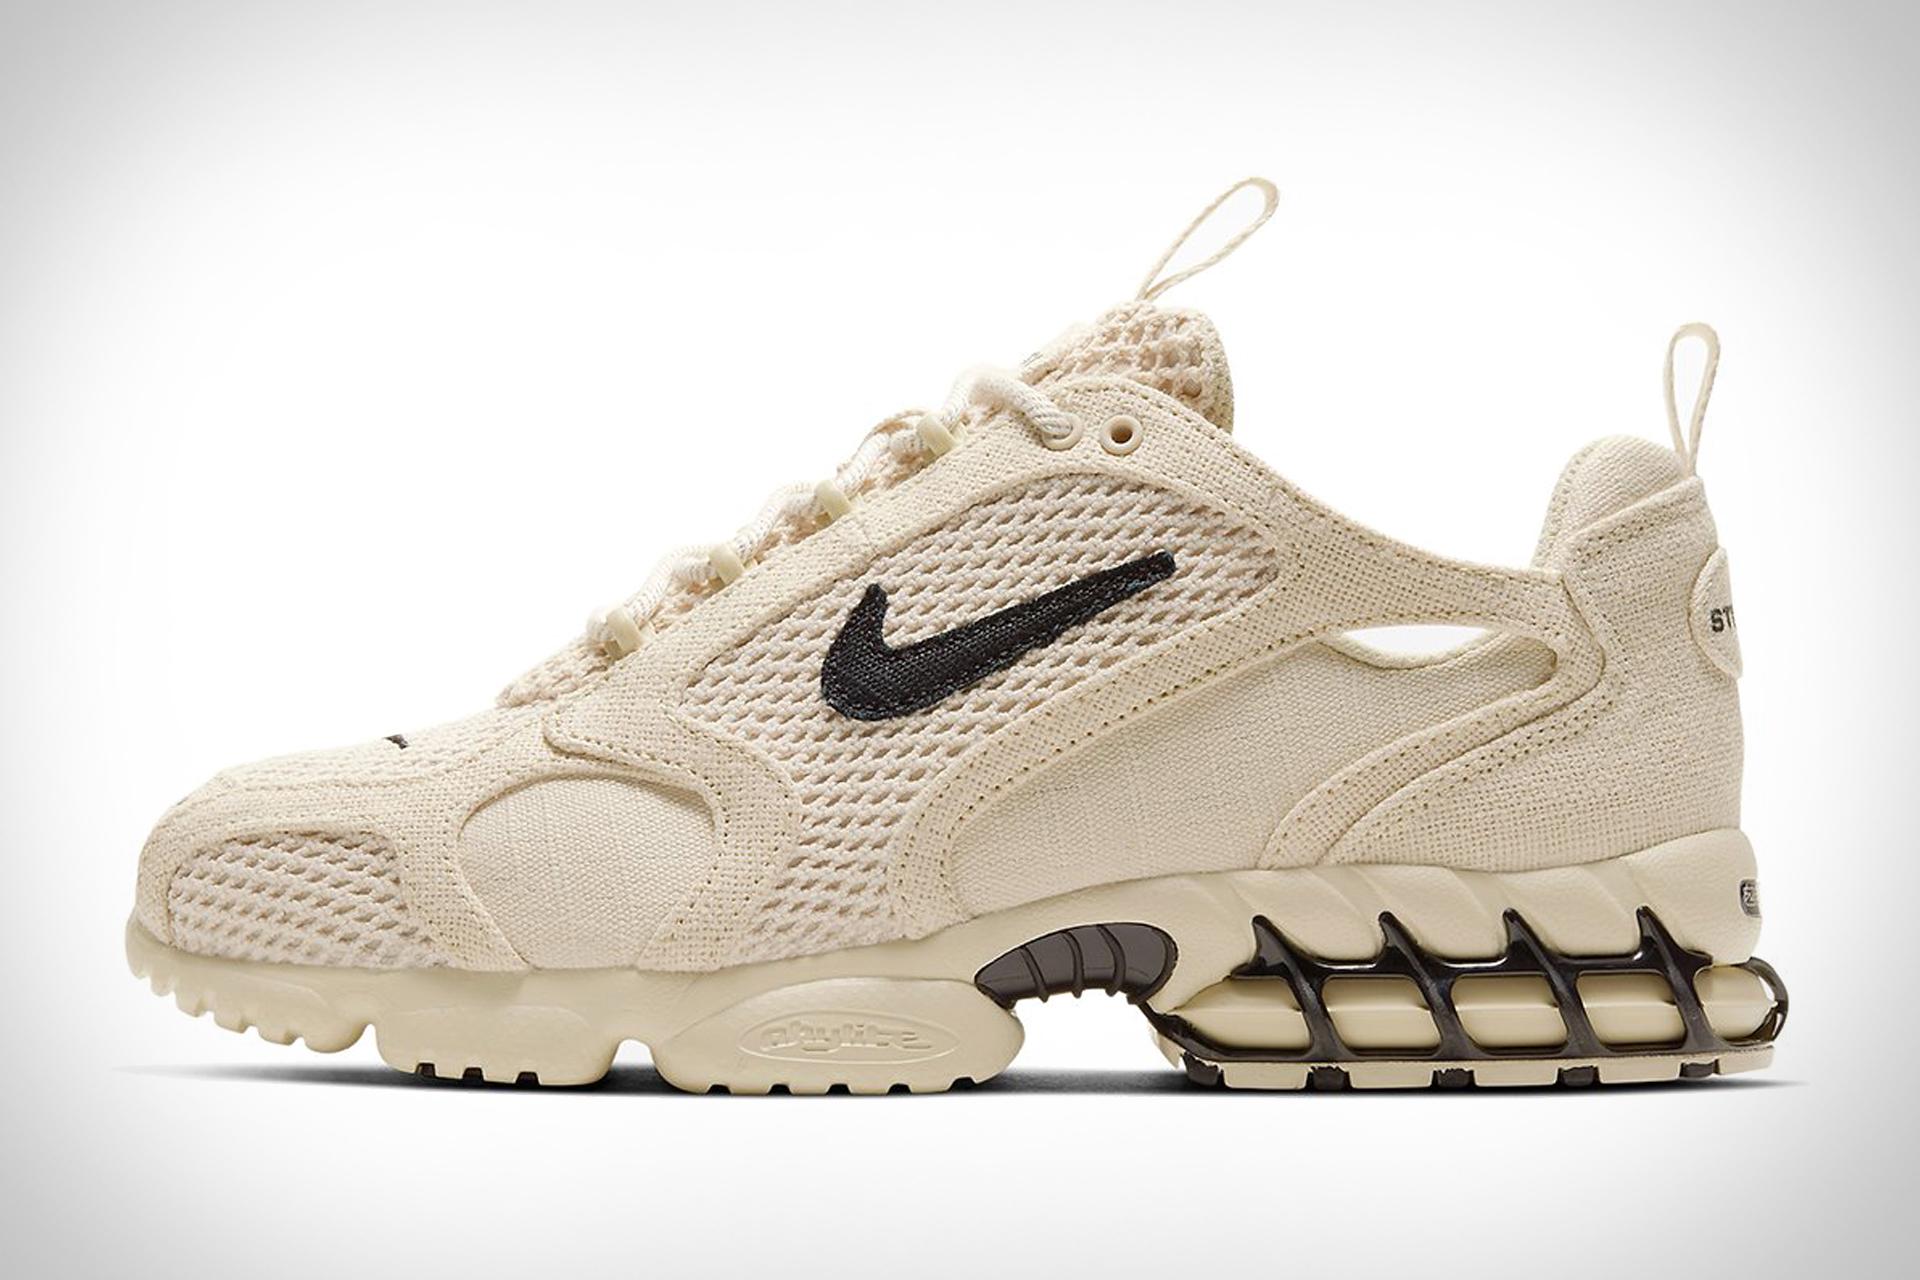 Nike x Stussy Air Zoom Spiridon Cage 2 Sneaker